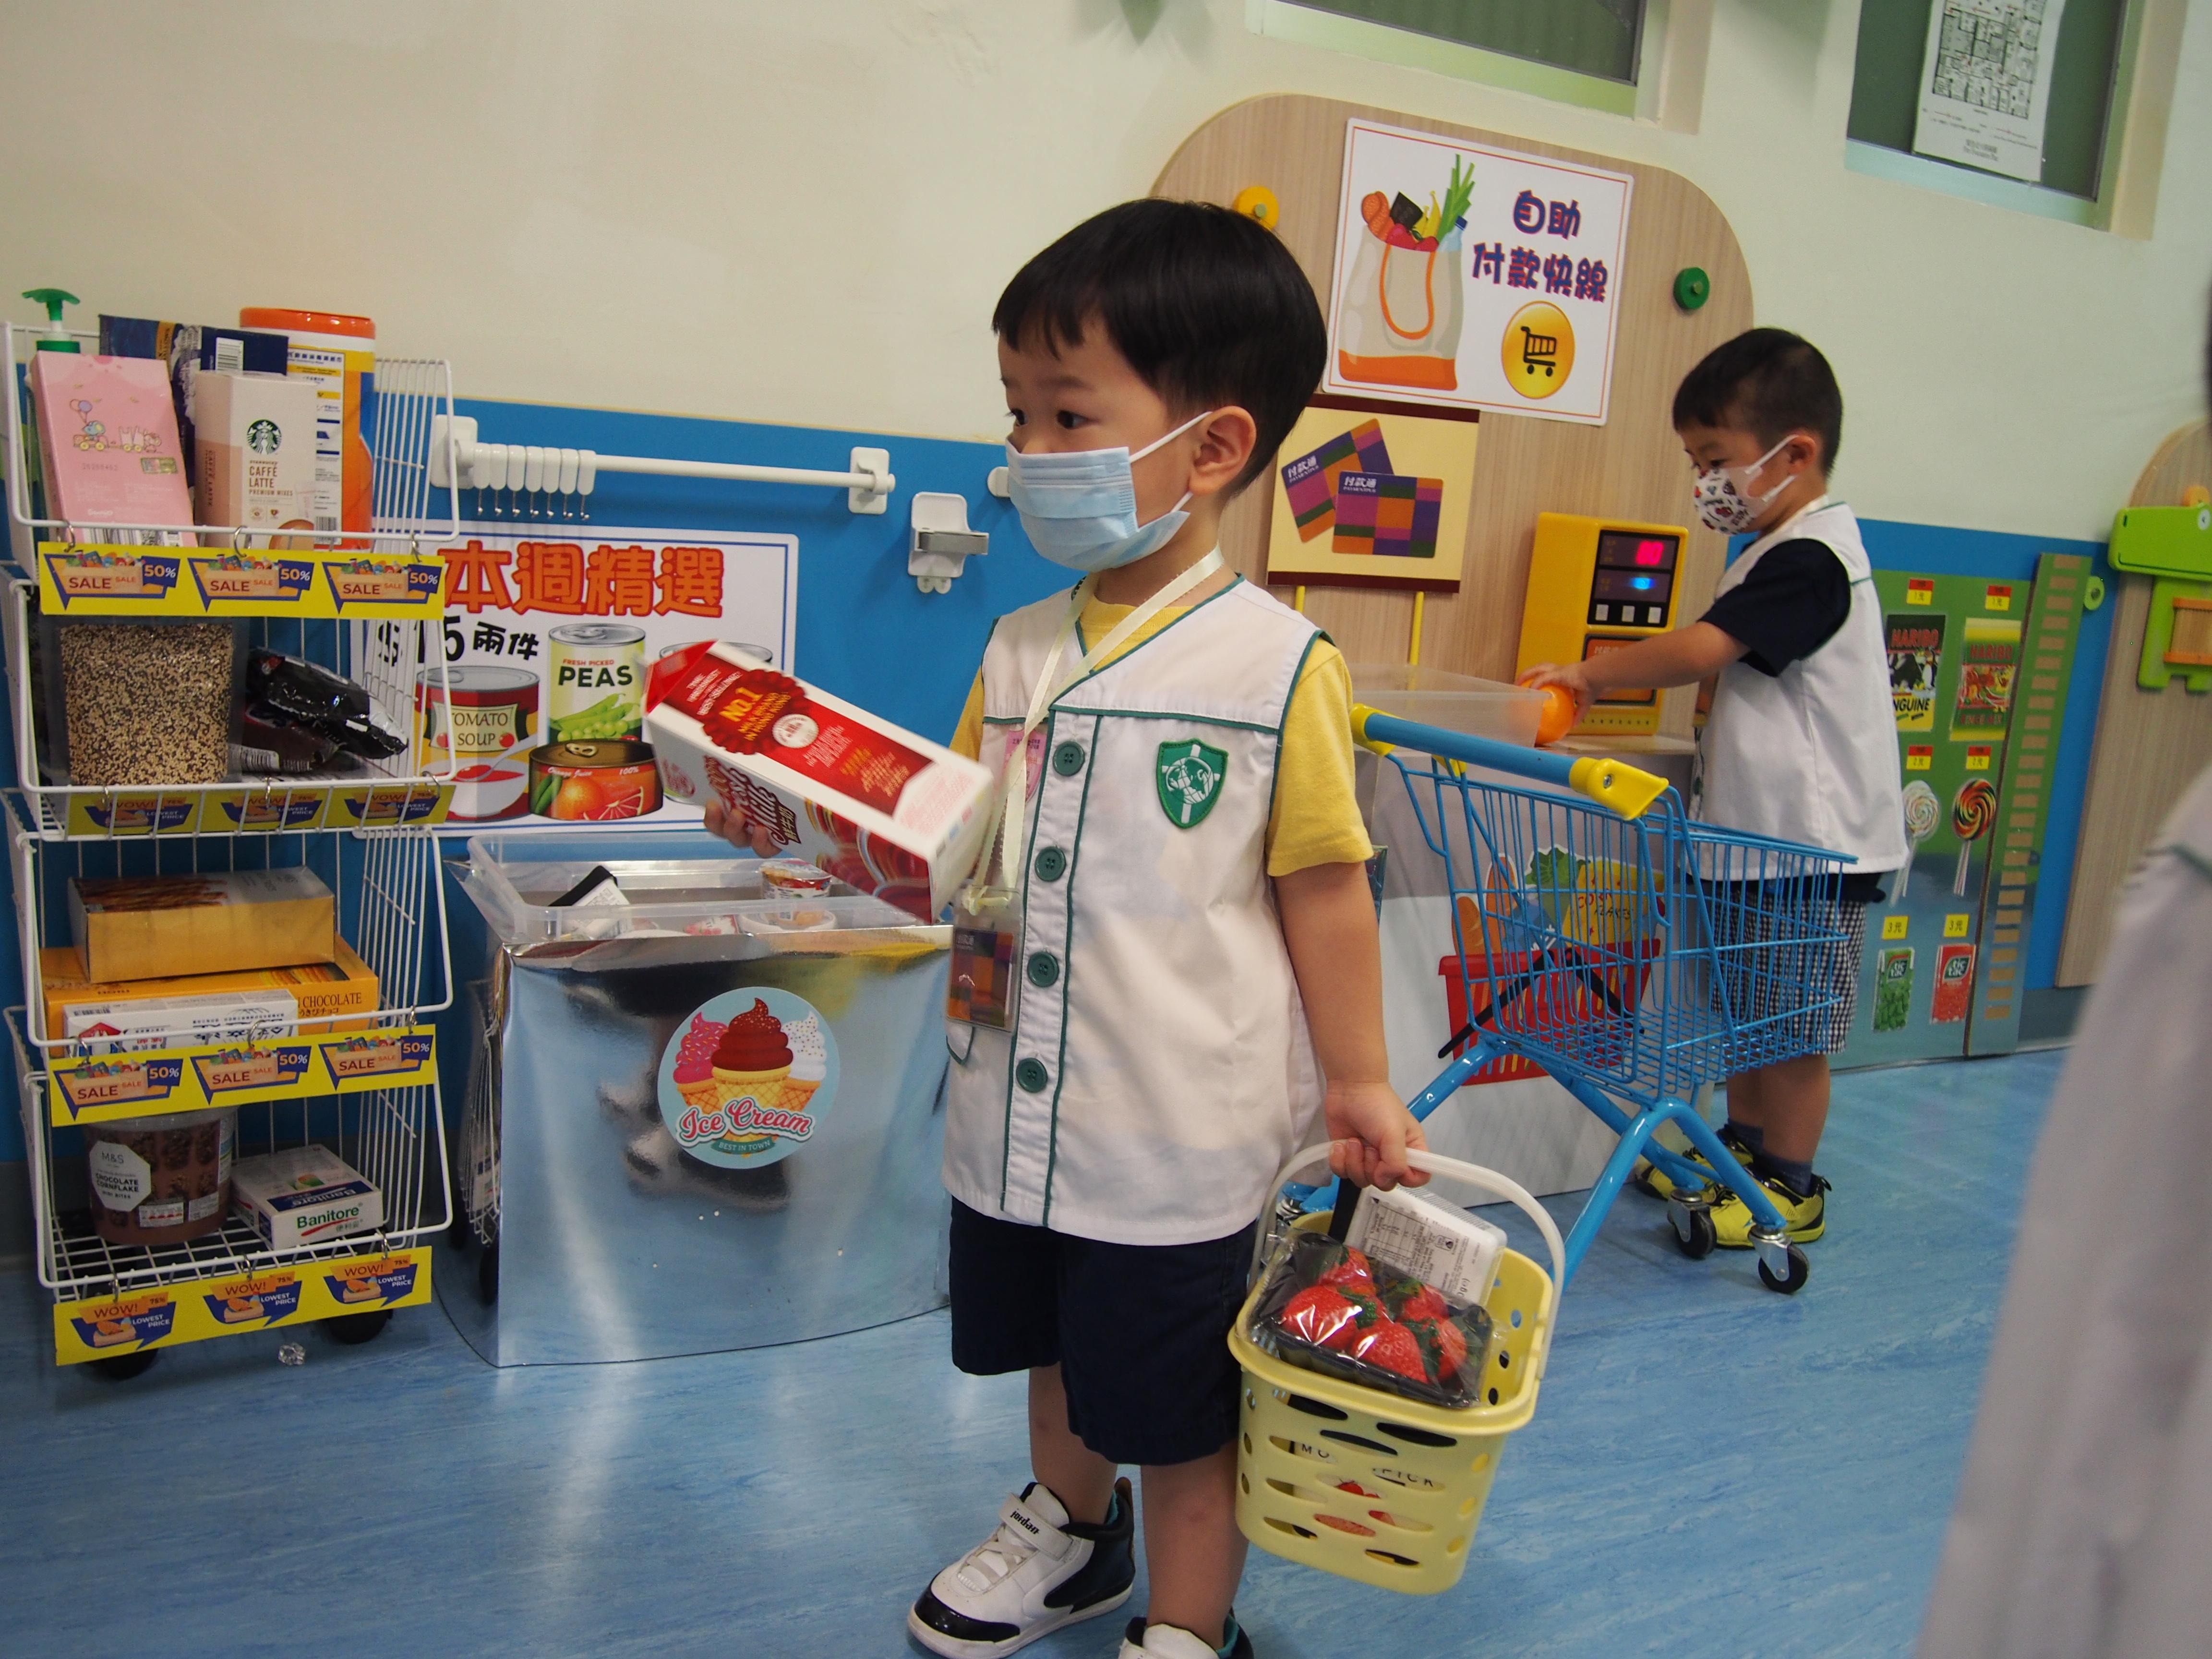 http://npmc.edu.hk/sites/default/files/p6290009_0.jpg